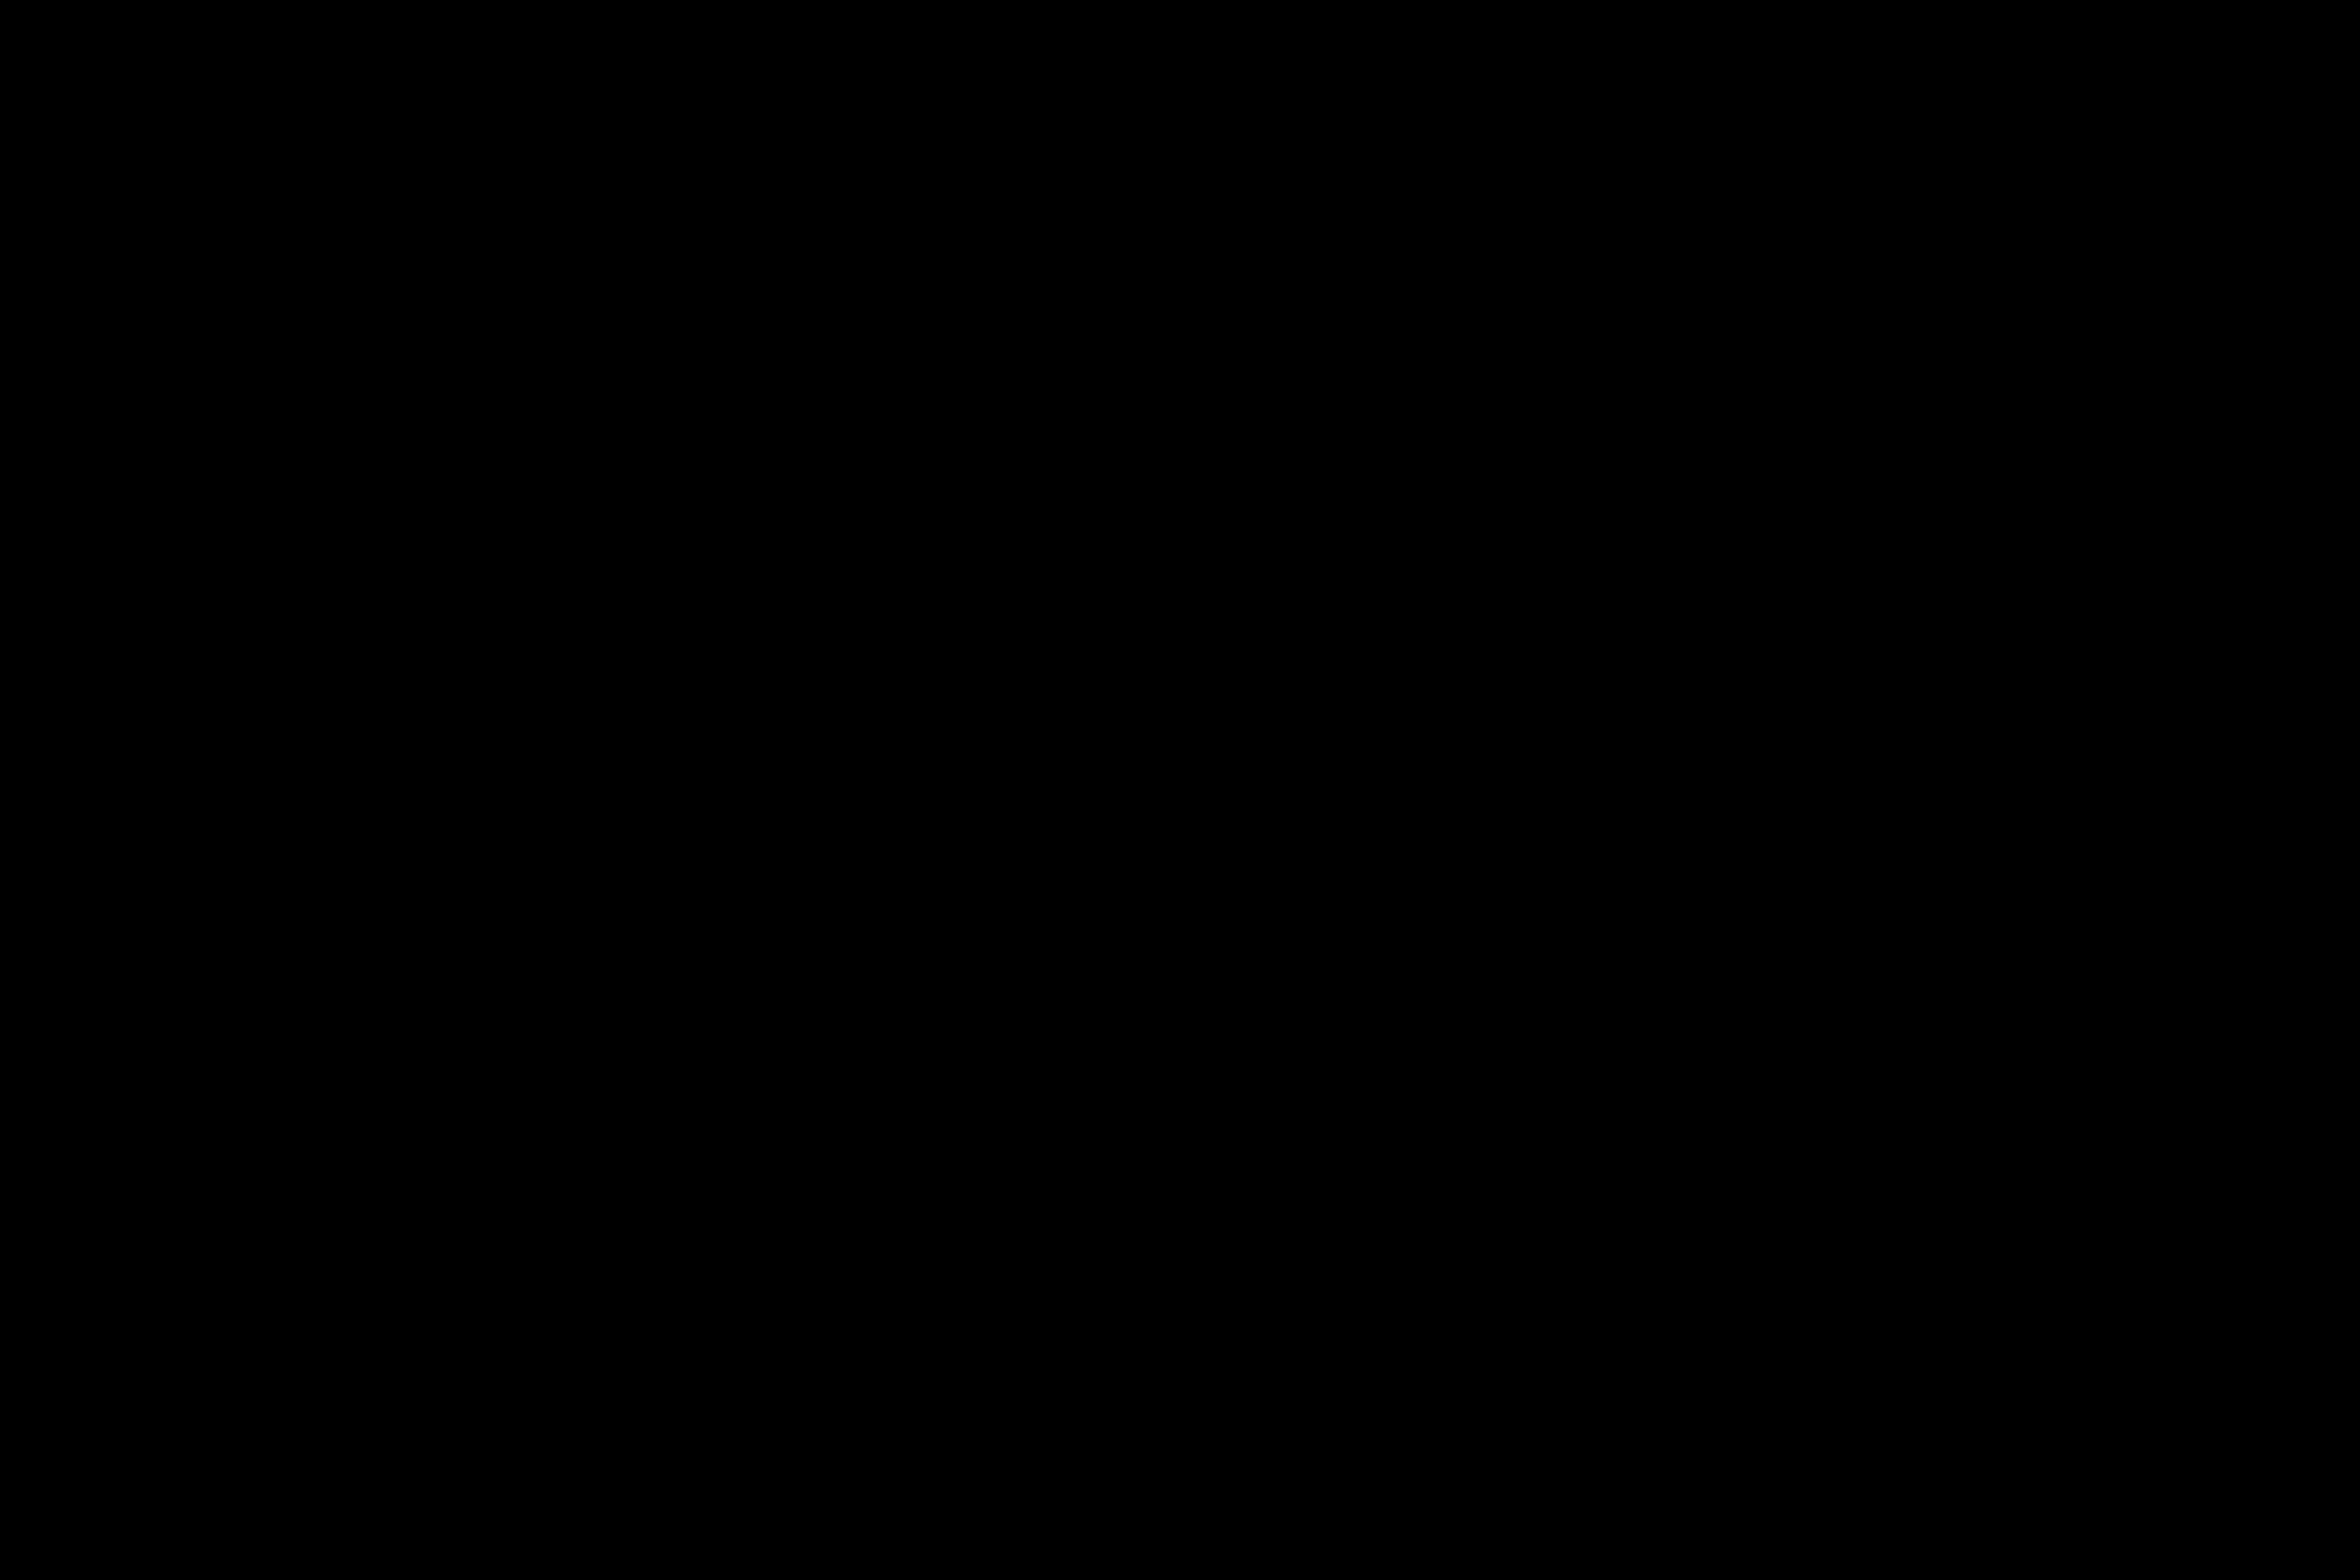 logo_khonthai BLACK-01.png